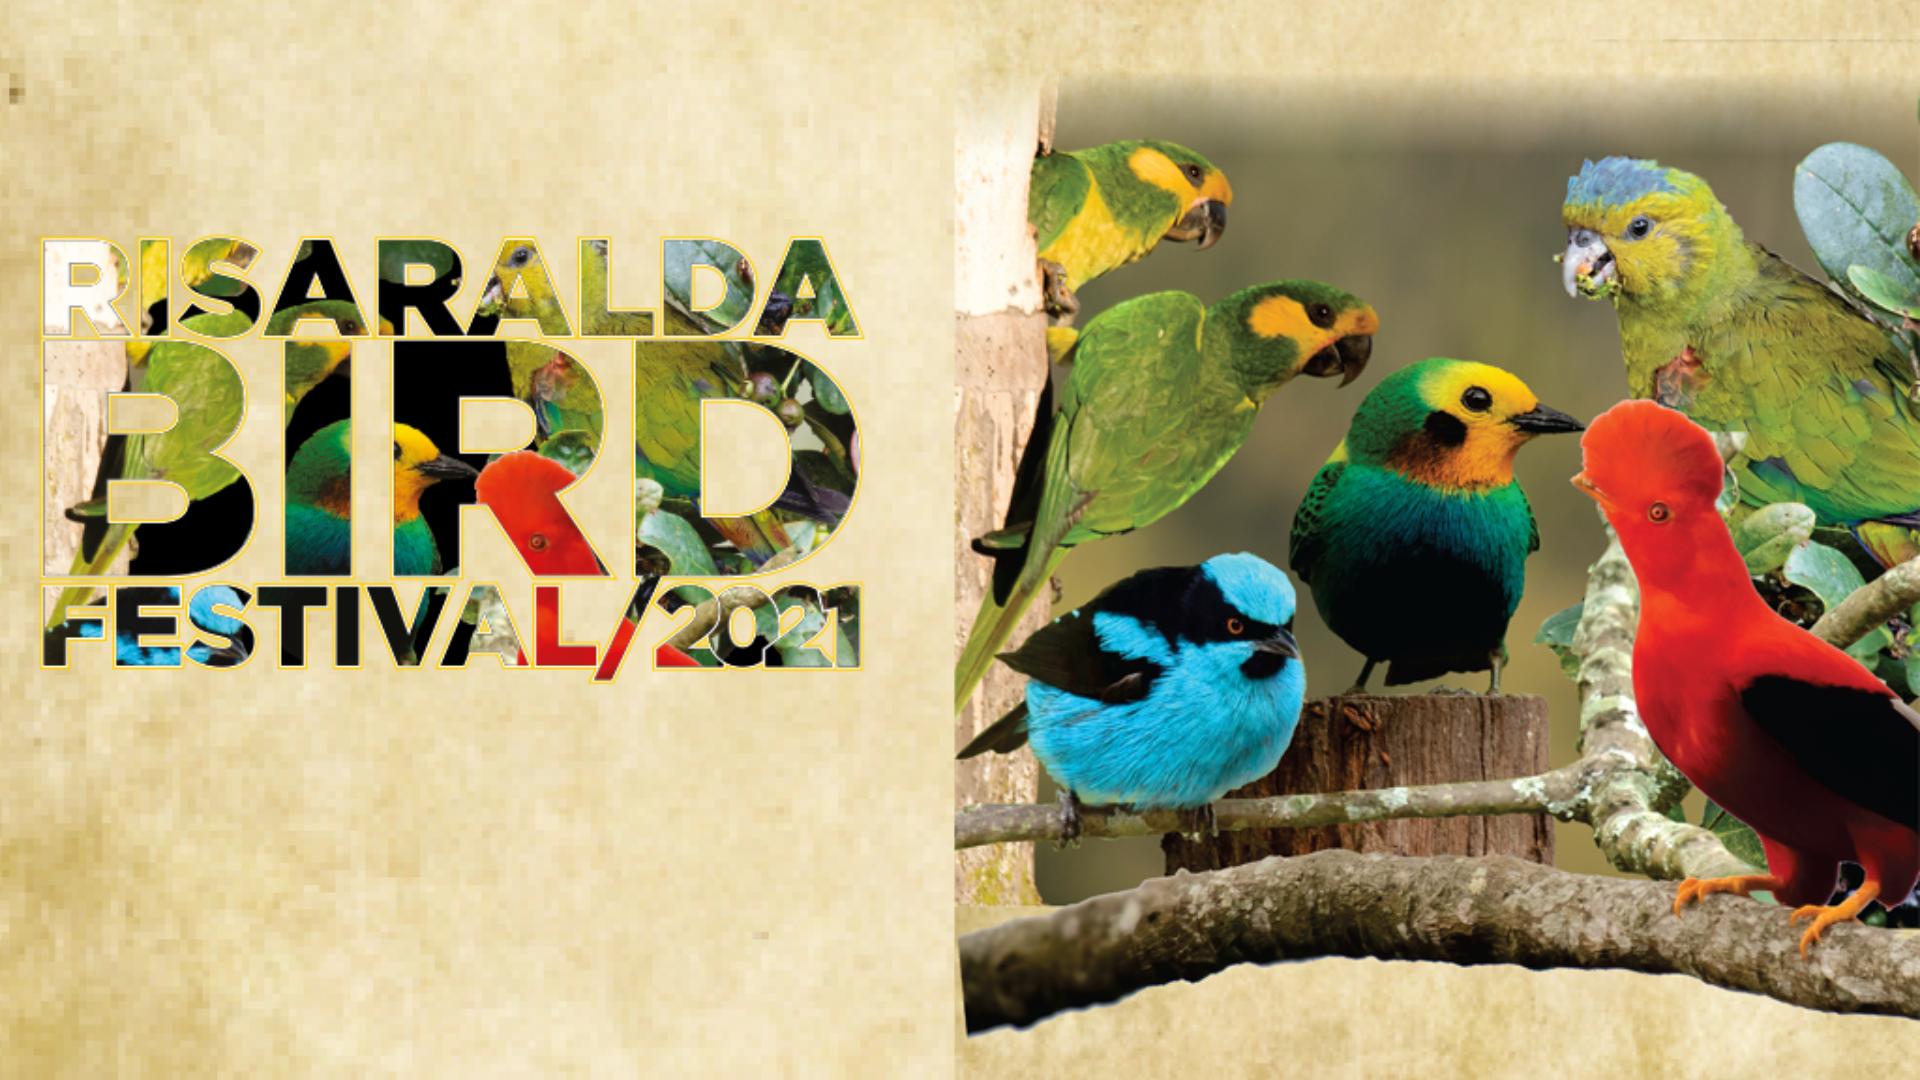 Risaralda Bird Festival